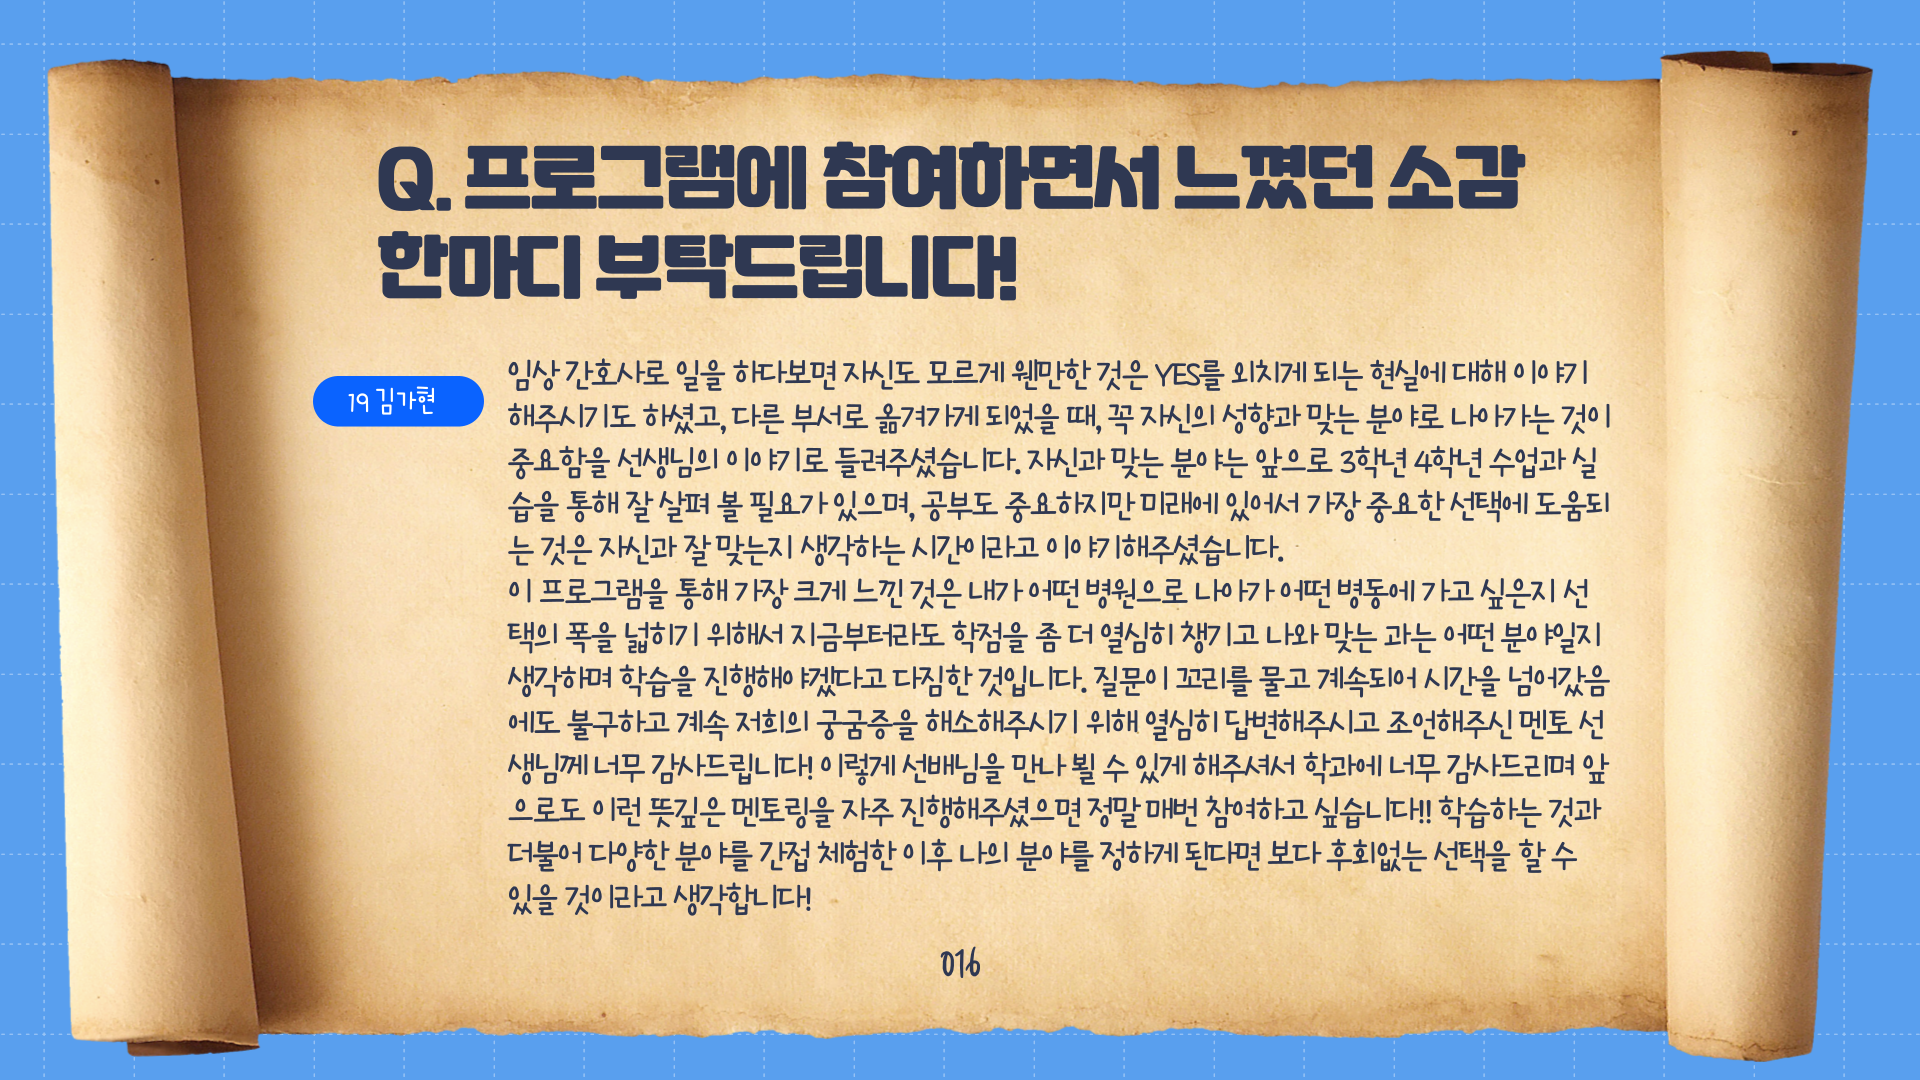 KakaoTalk_20210211_133148854_15.png